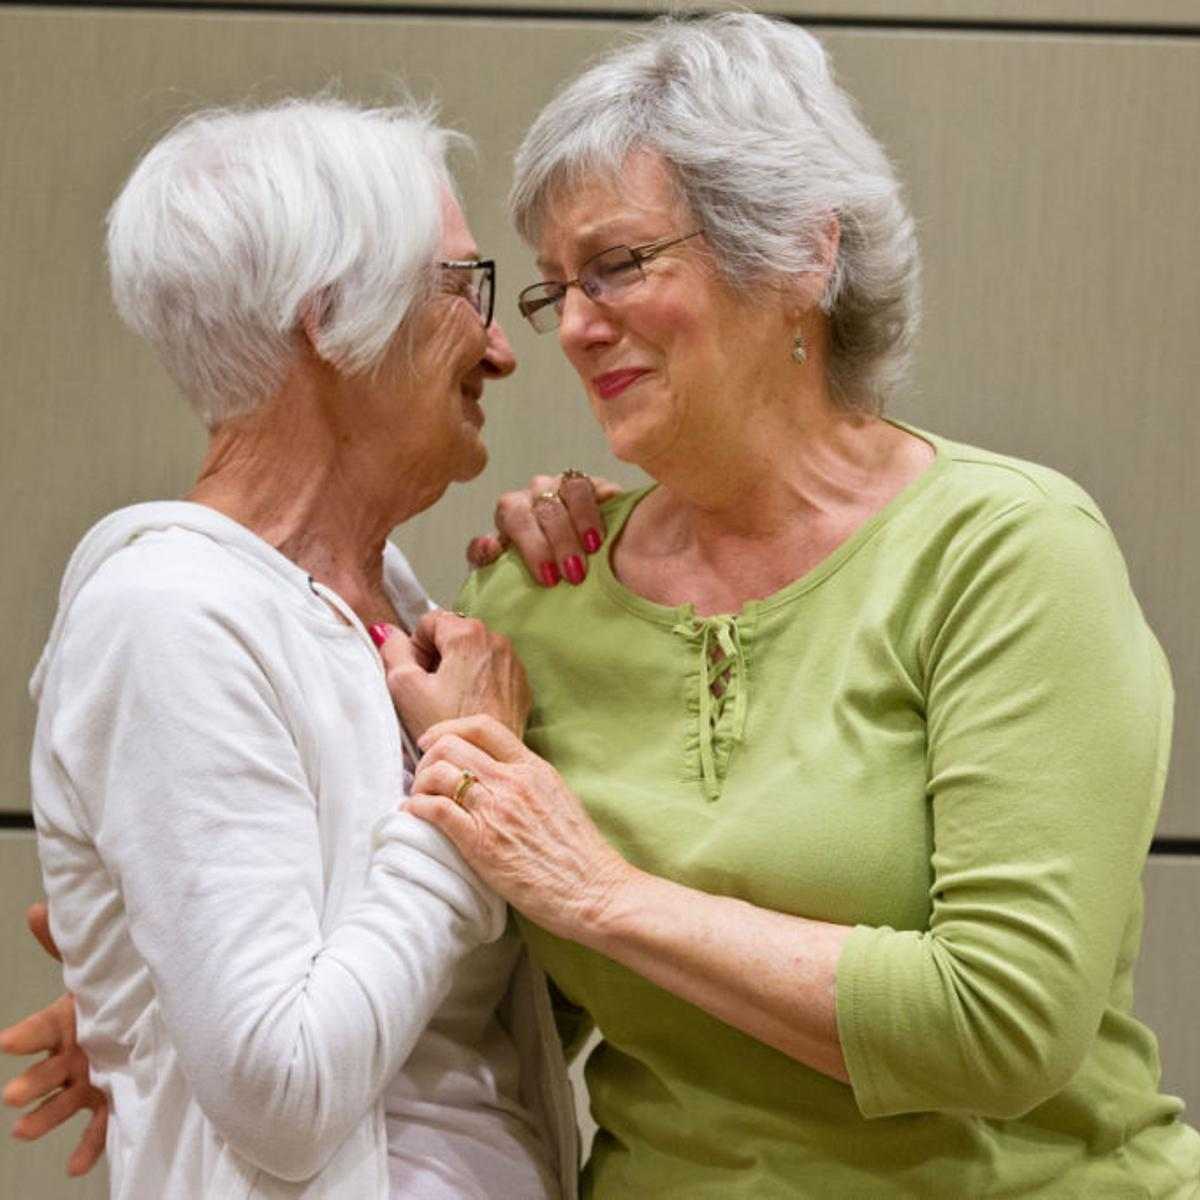 Survivors Relatives Of United Flight 232 Crash Victims Share Memories State And Regional News Omaha Com